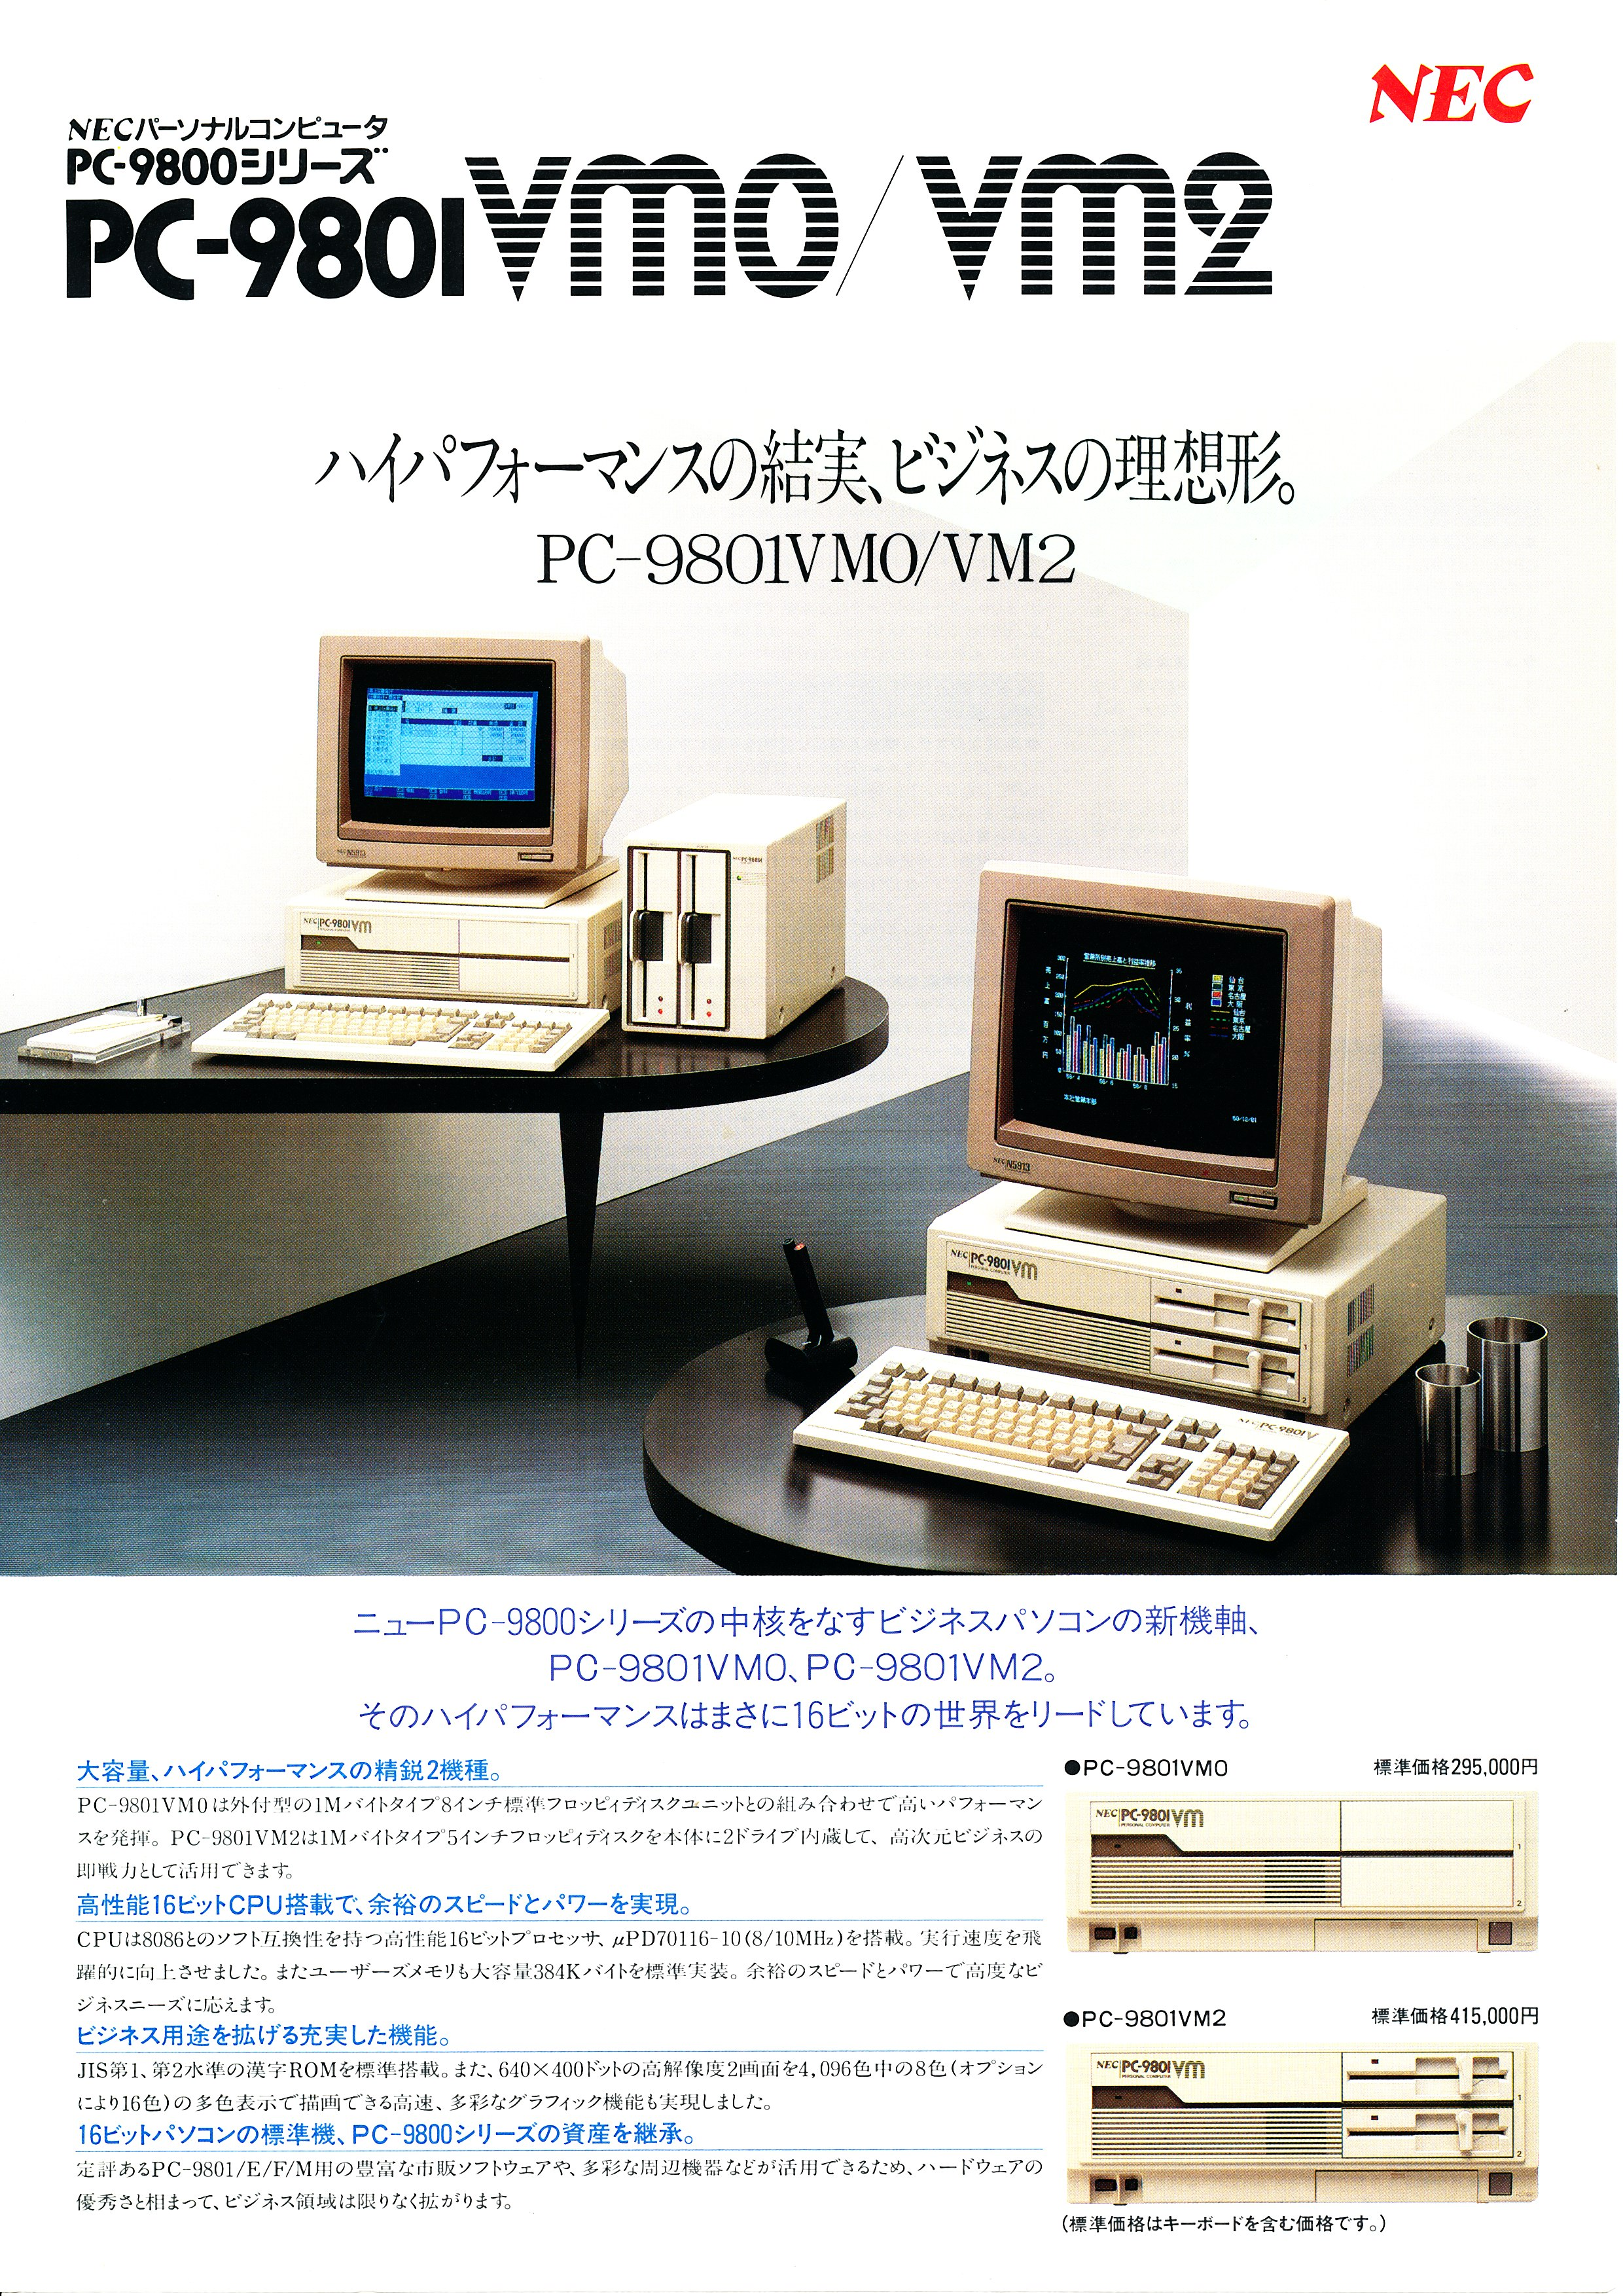 PC-9801VM P1